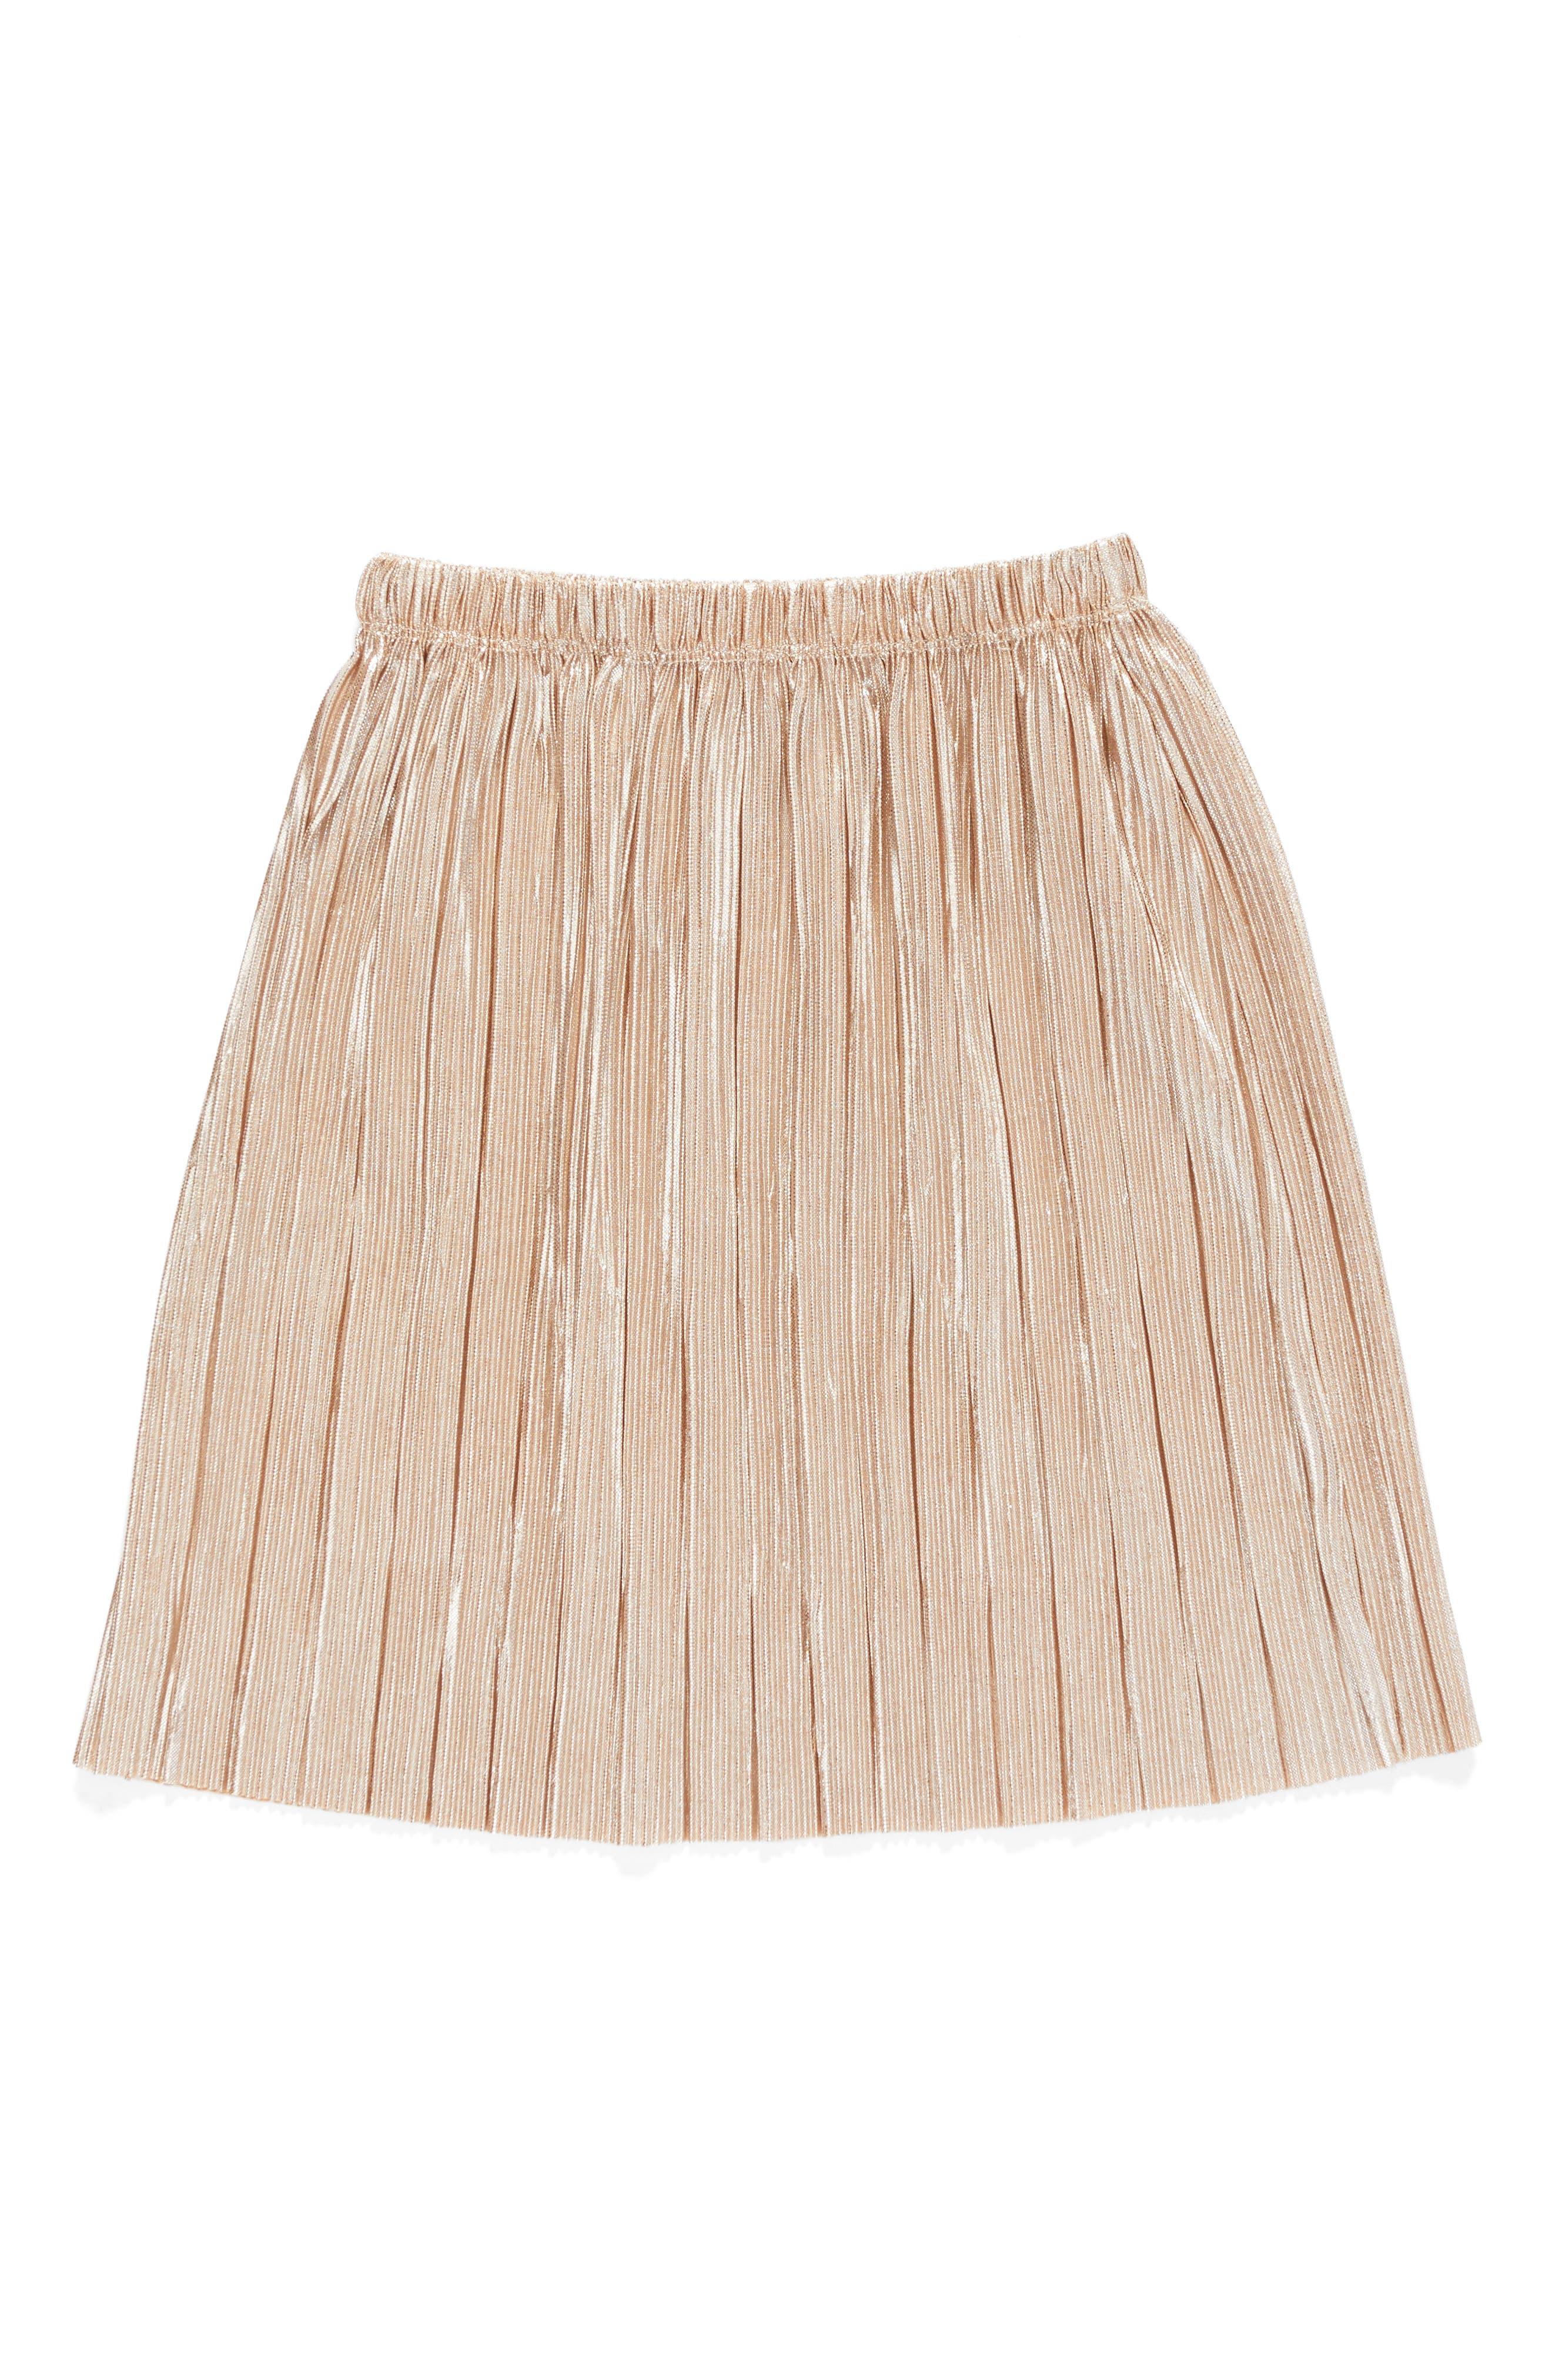 Alternate Image 1 Selected - Truly Me Metallic Pleated Skirt (Toddler Girls & Little Girls)